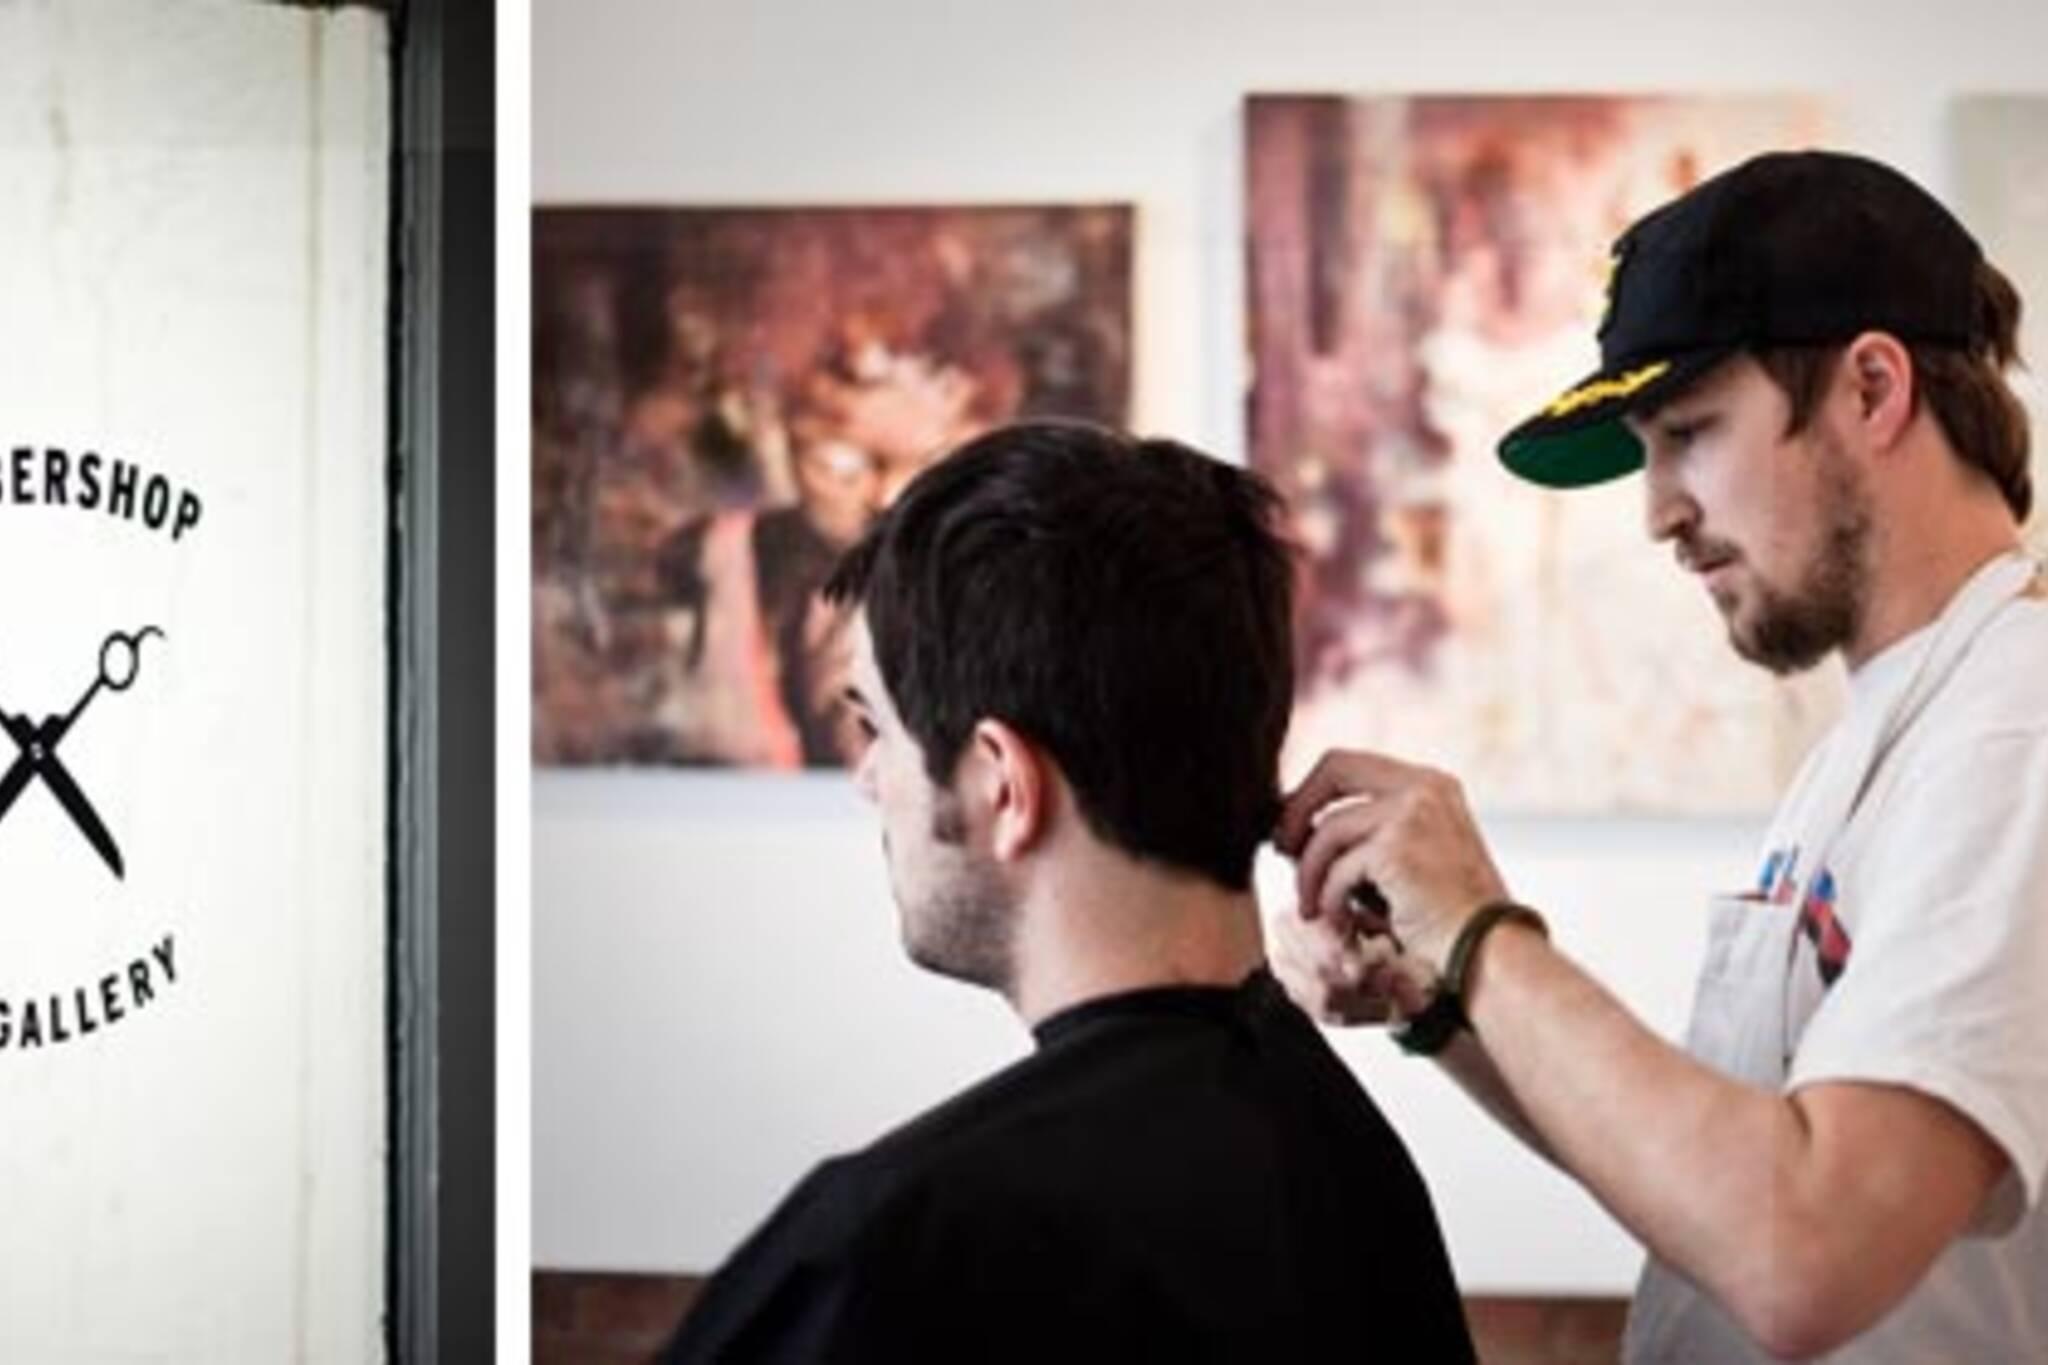 Adam Hilborn of The Barbershop